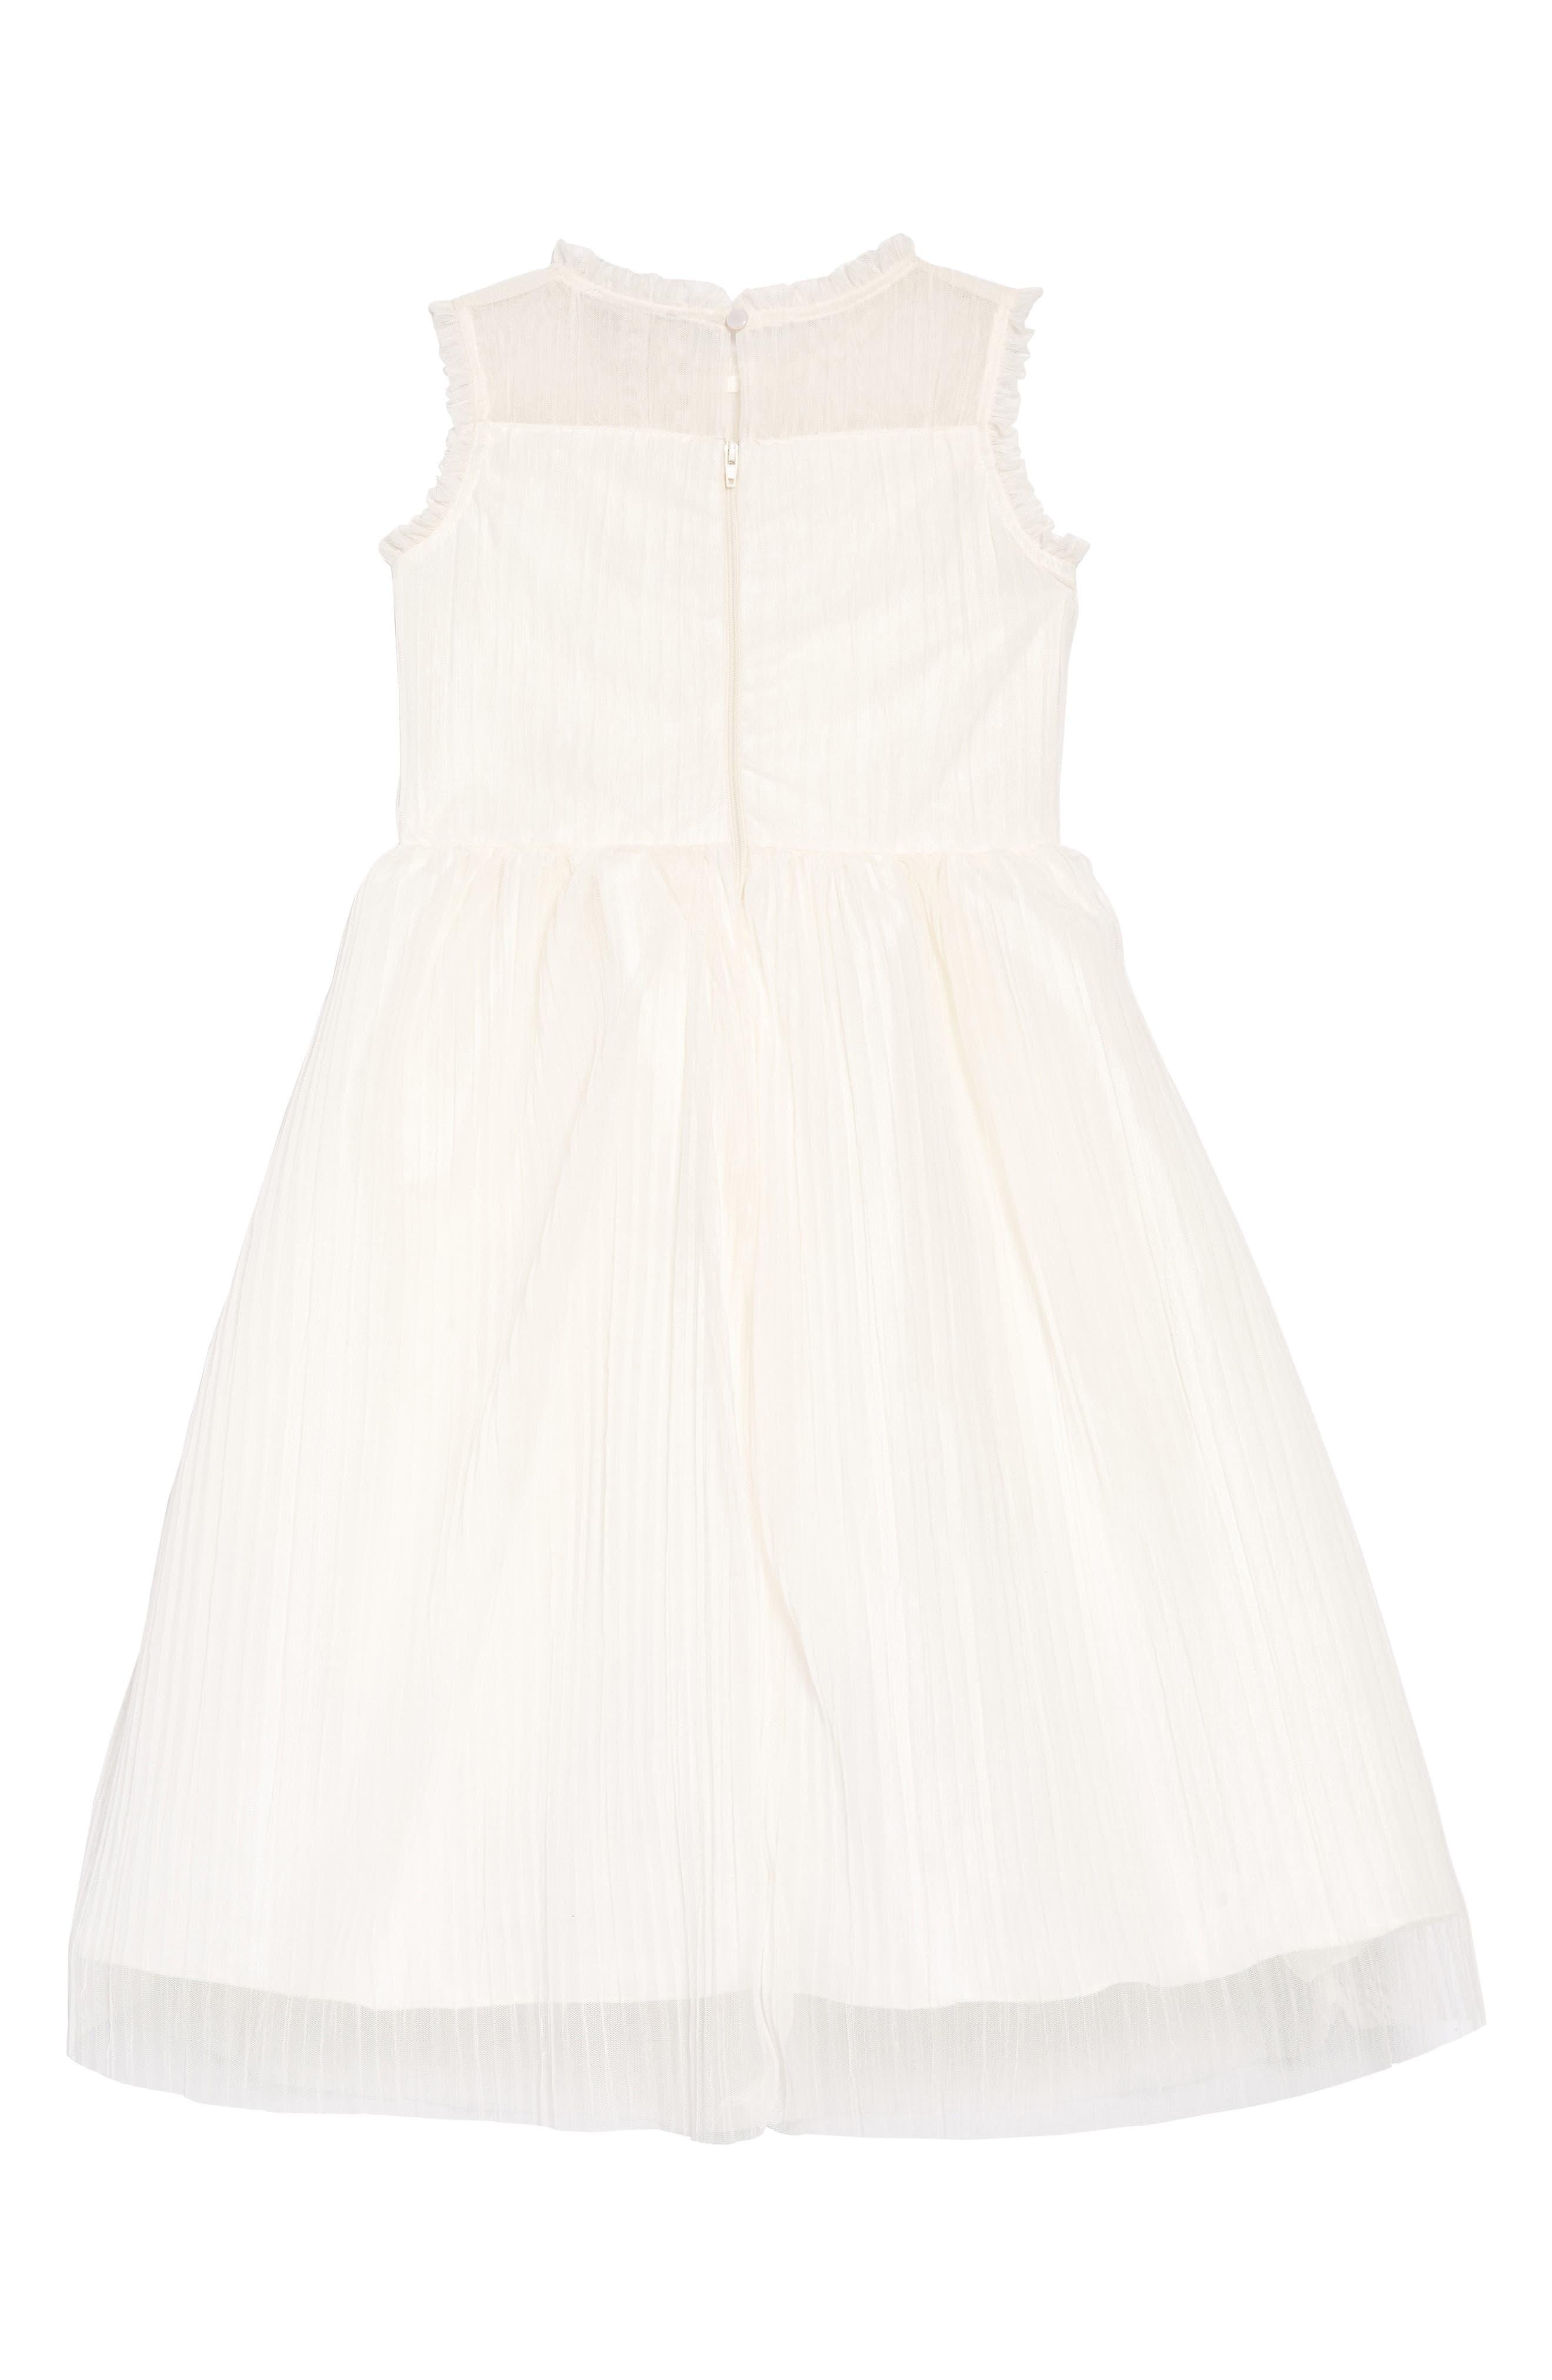 AVA & YELLY, Plissé Mesh Dress, Alternate thumbnail 2, color, IVORY